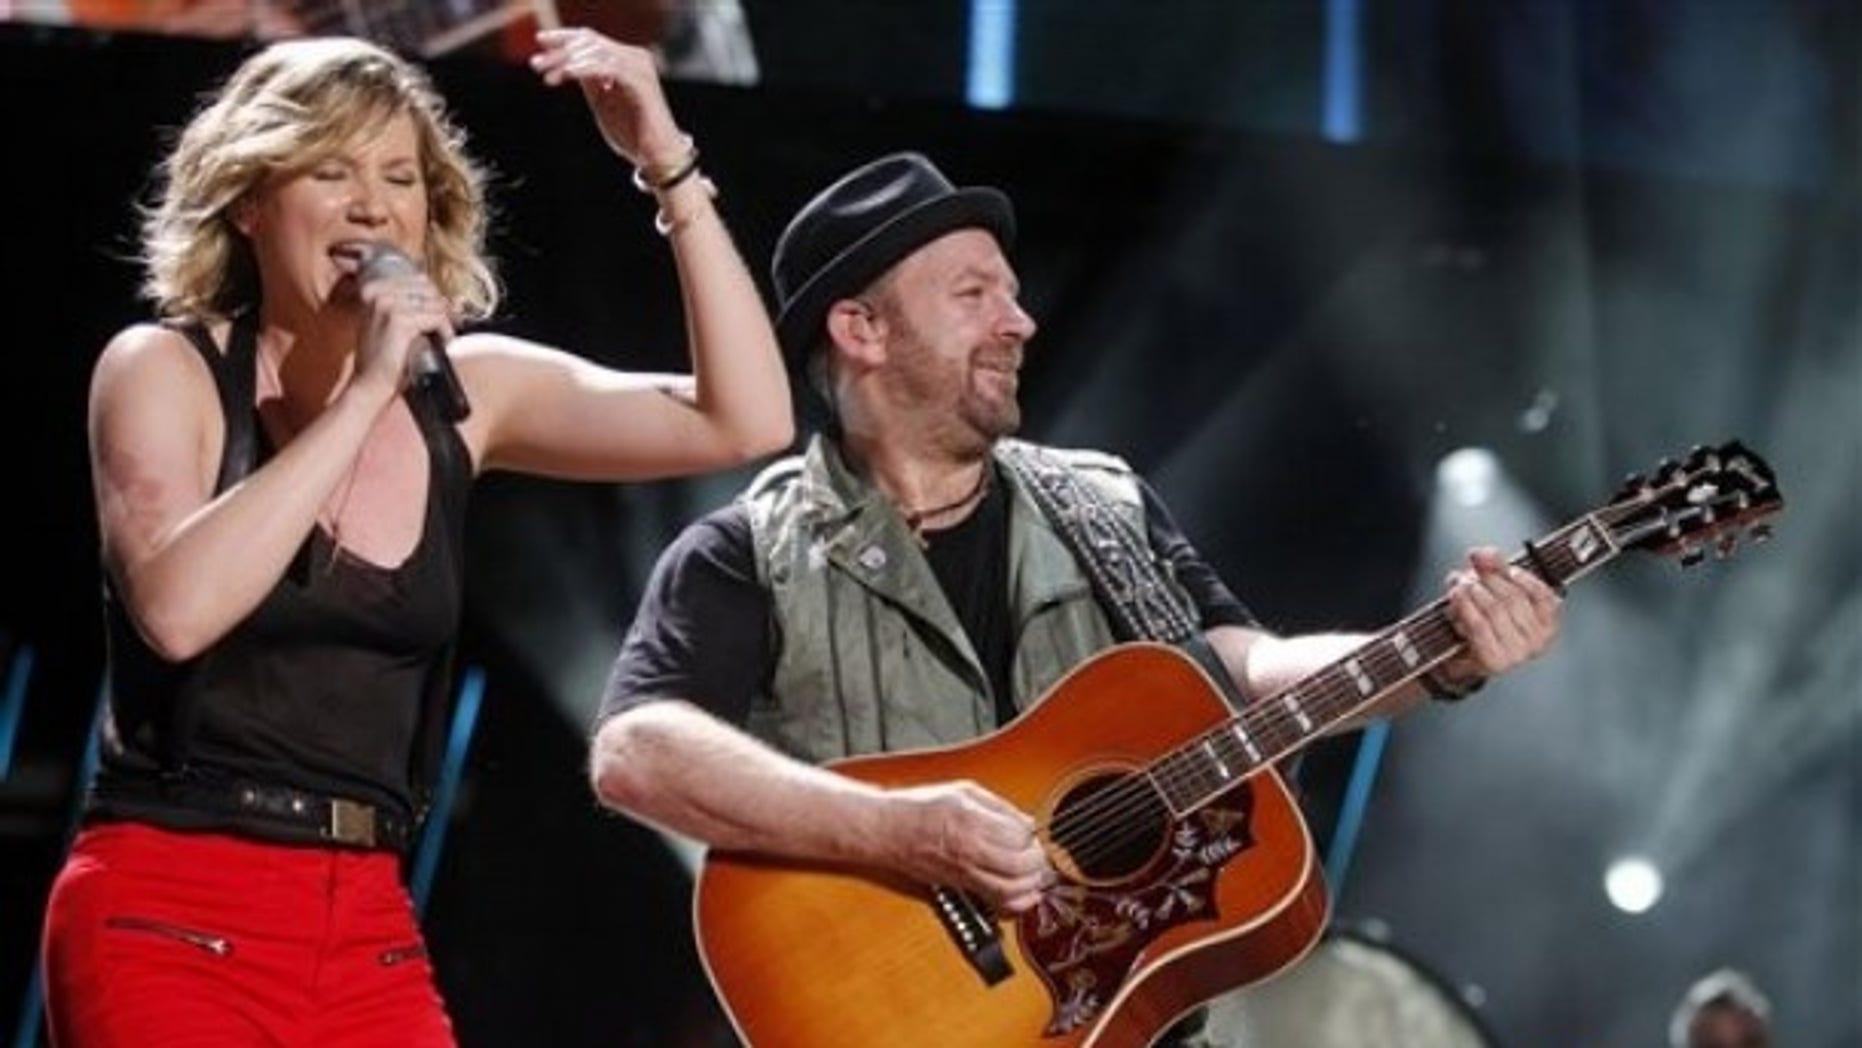 June 10: Jennifer Nettles, left, and Christian Bush of Sugarland perform during the CMA Fan Festival. (AP)